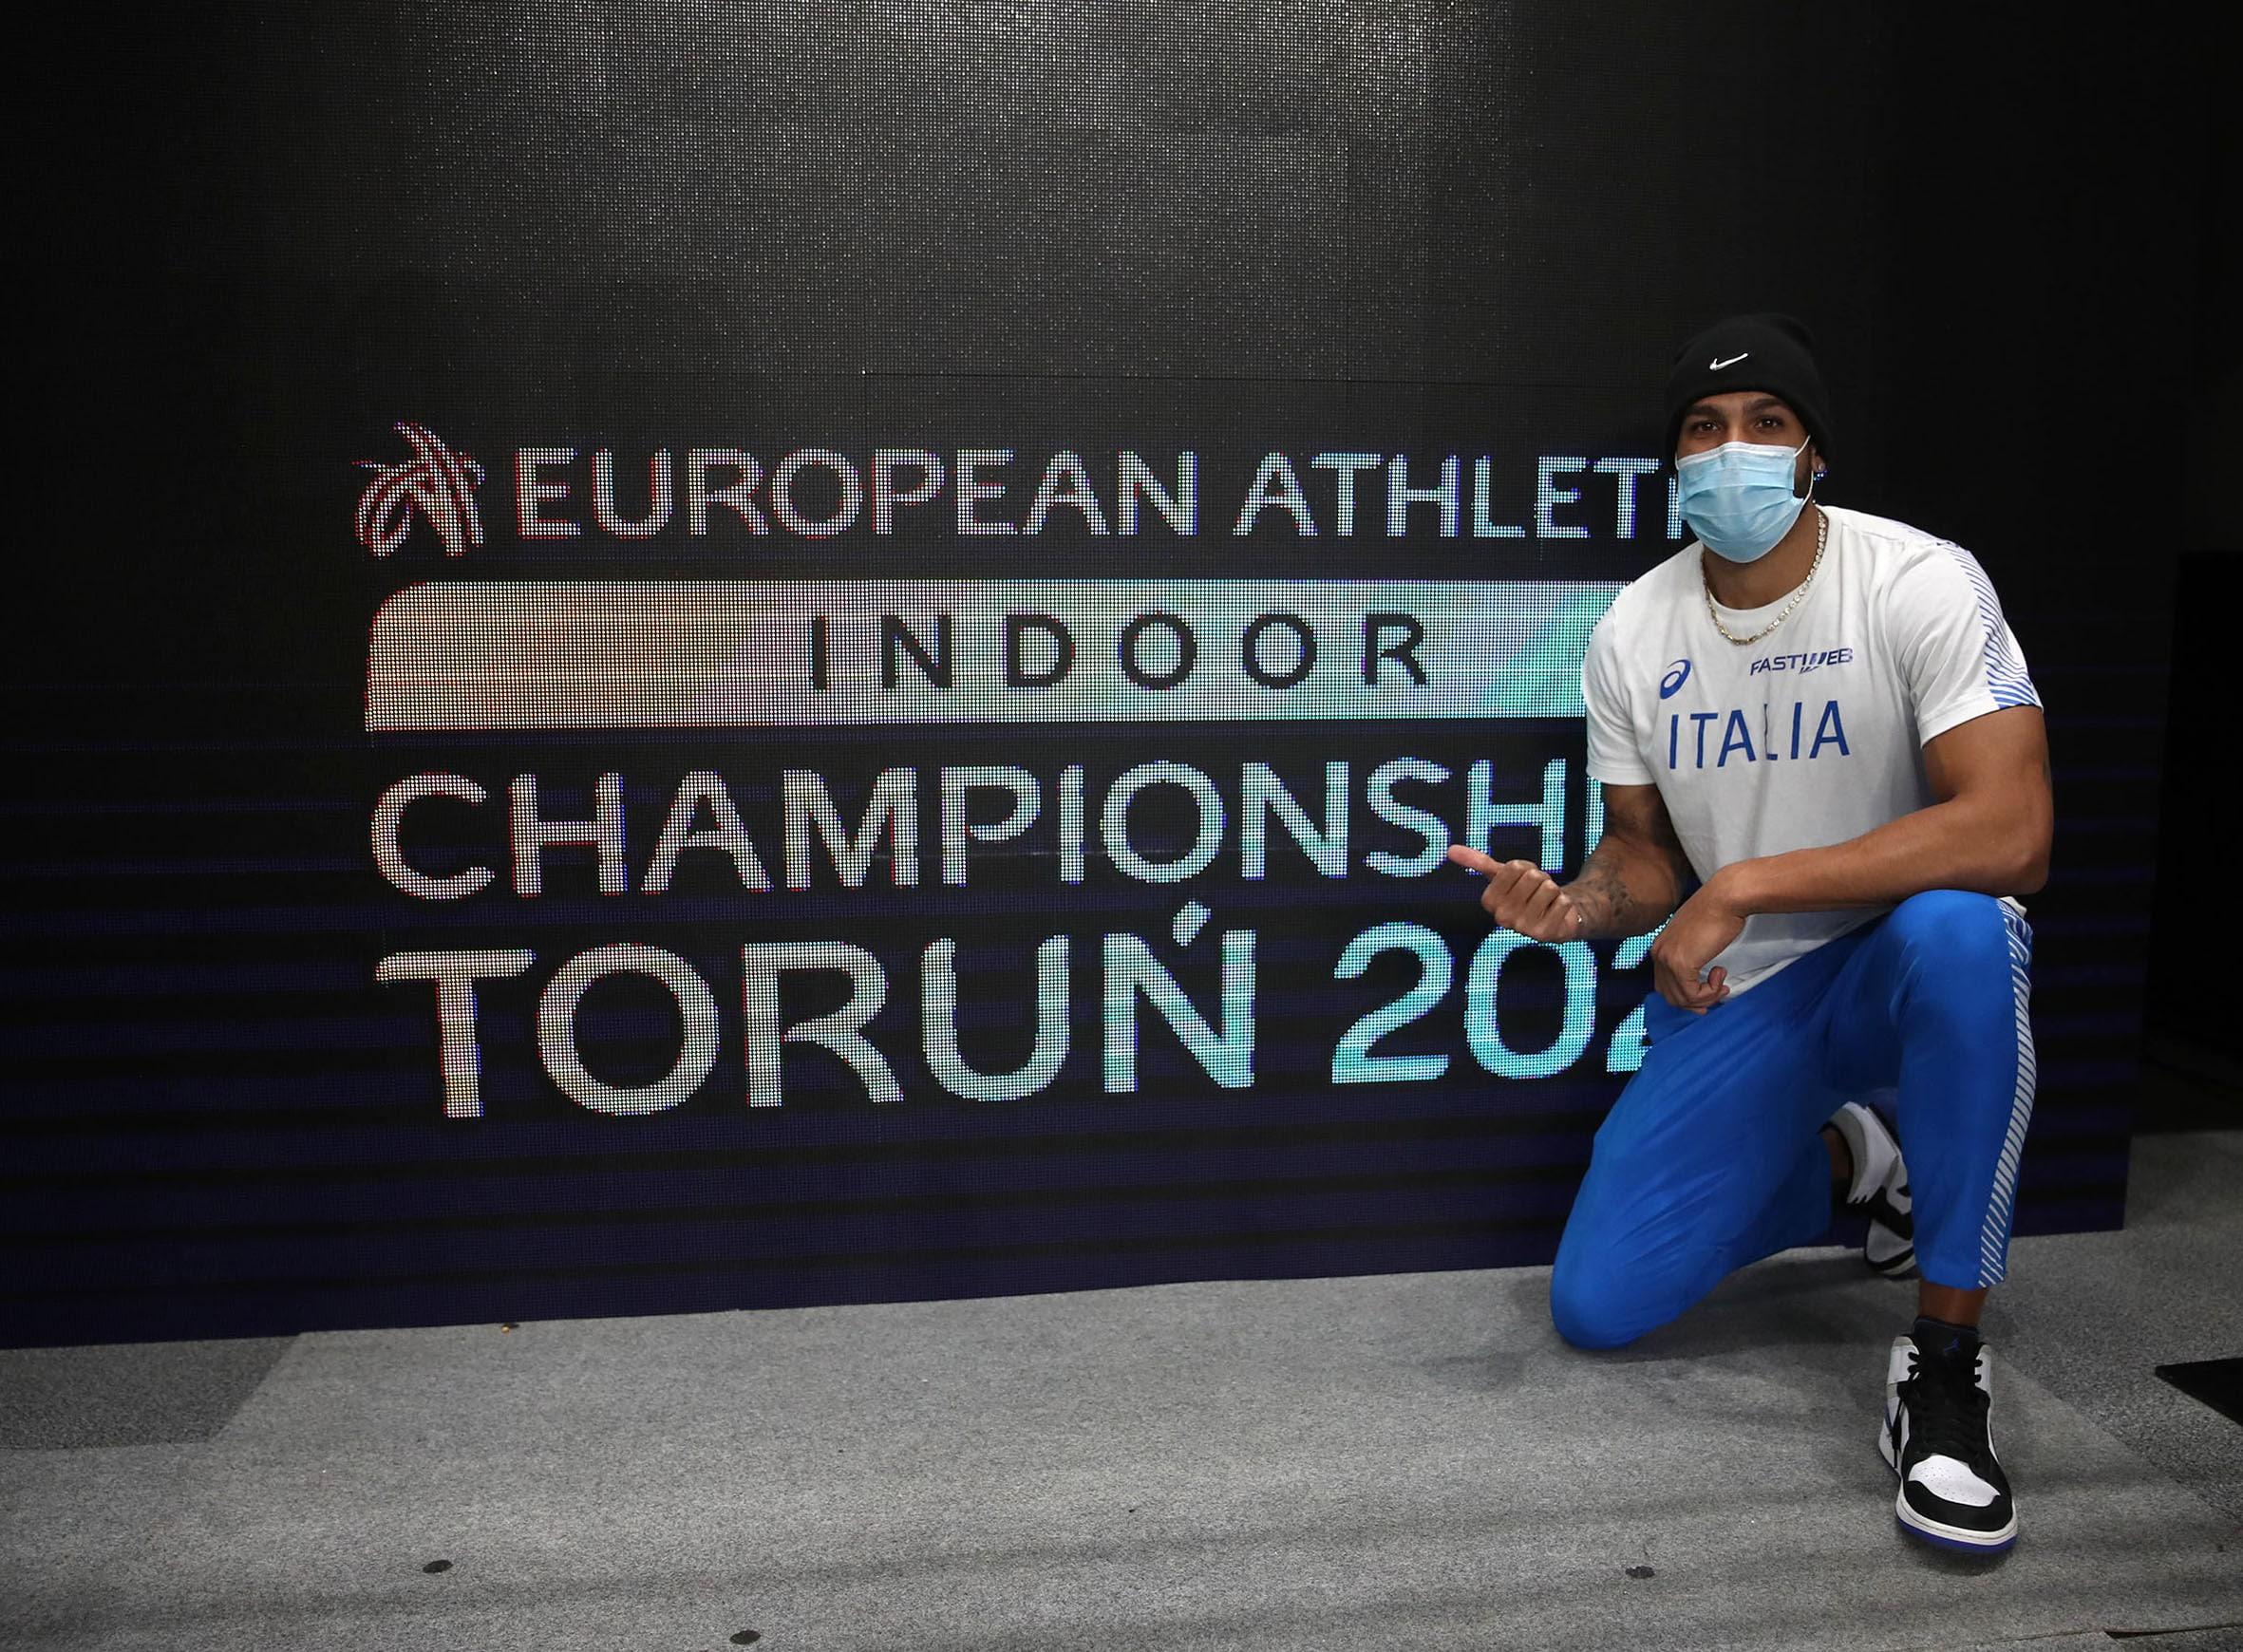 Torun (Polonia), 4-7 /03/ 2021 Campionati Europei Indoor di Atletica Leggera - EAA European Athletics Indoor Championships - Foto Giancarlo Colombo/A.G.Giancarlo Colombo